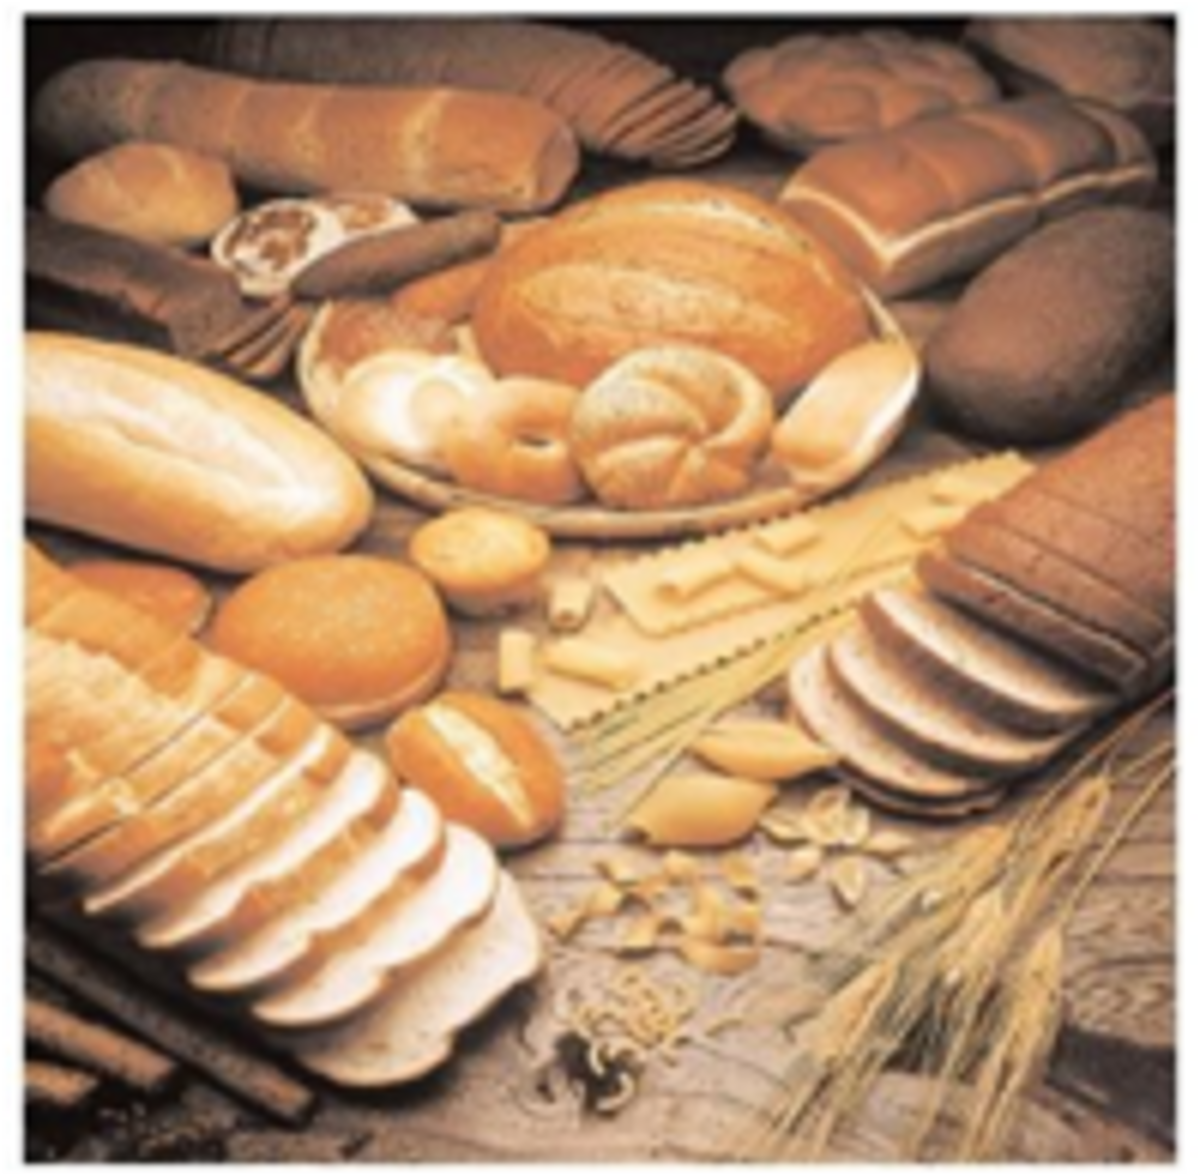 Carbohydrates: Mono saccharides, Di saccharides, Poly saccharides, Muco saccharides and  Oligo saccharides